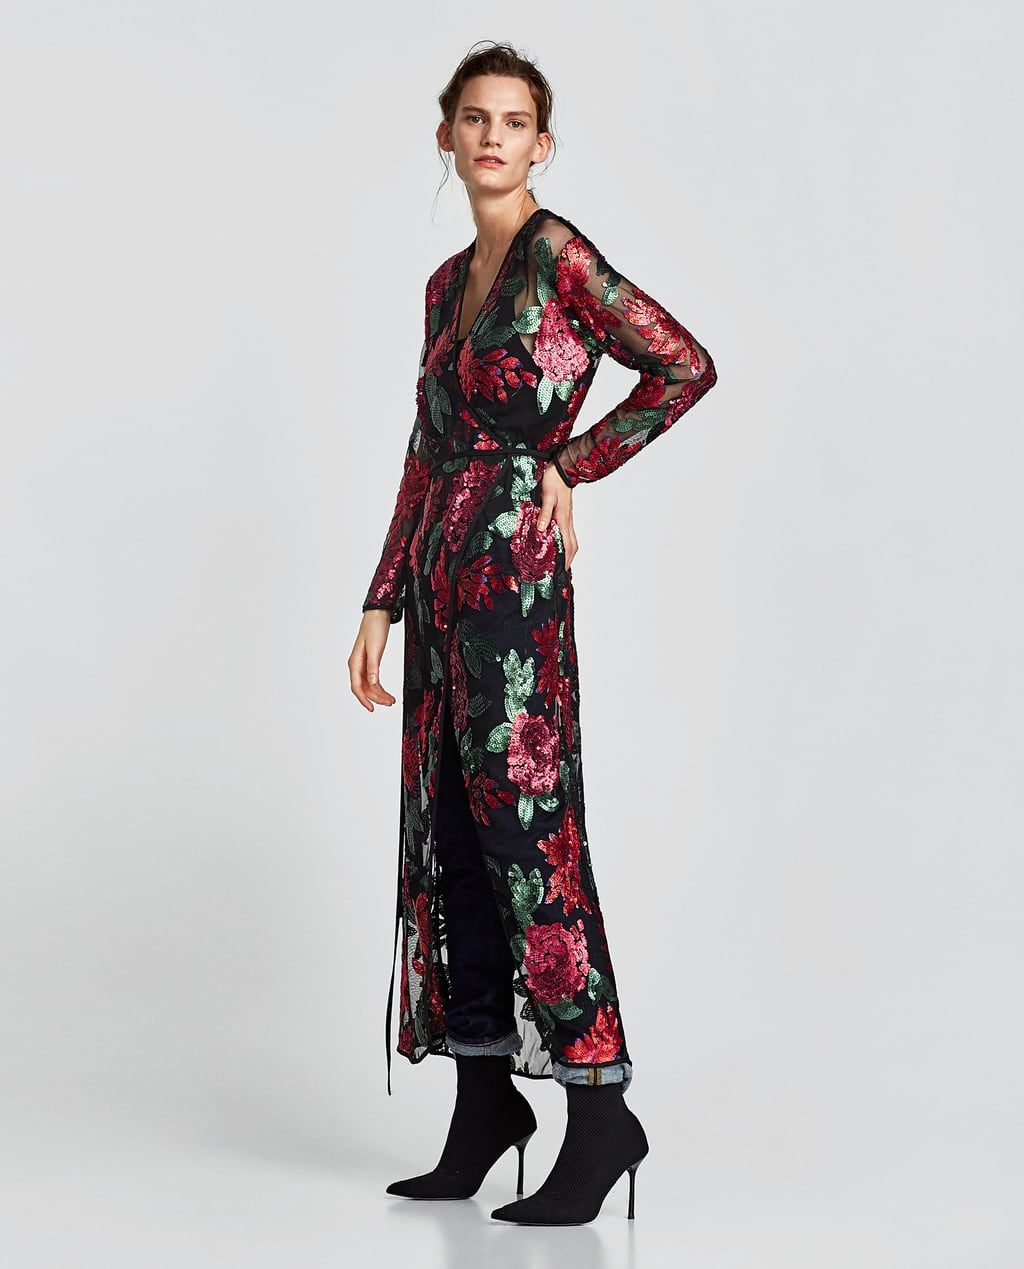 ZARA - WOMAN - SEQUINNED CROSSOVER DRESS eb677f7ea1f